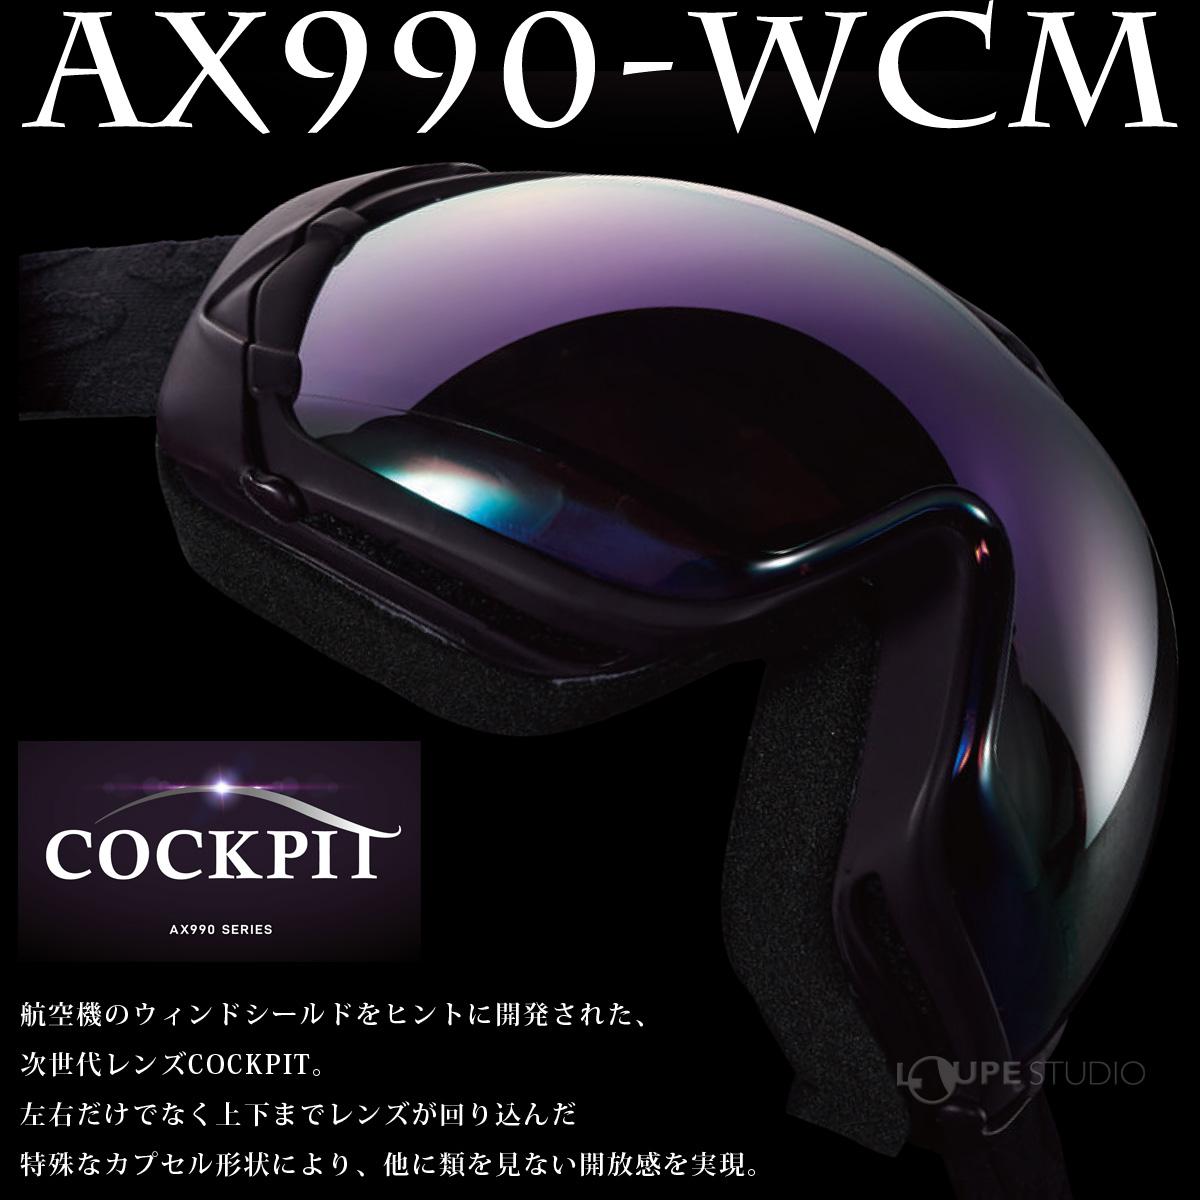 AX990-WCM